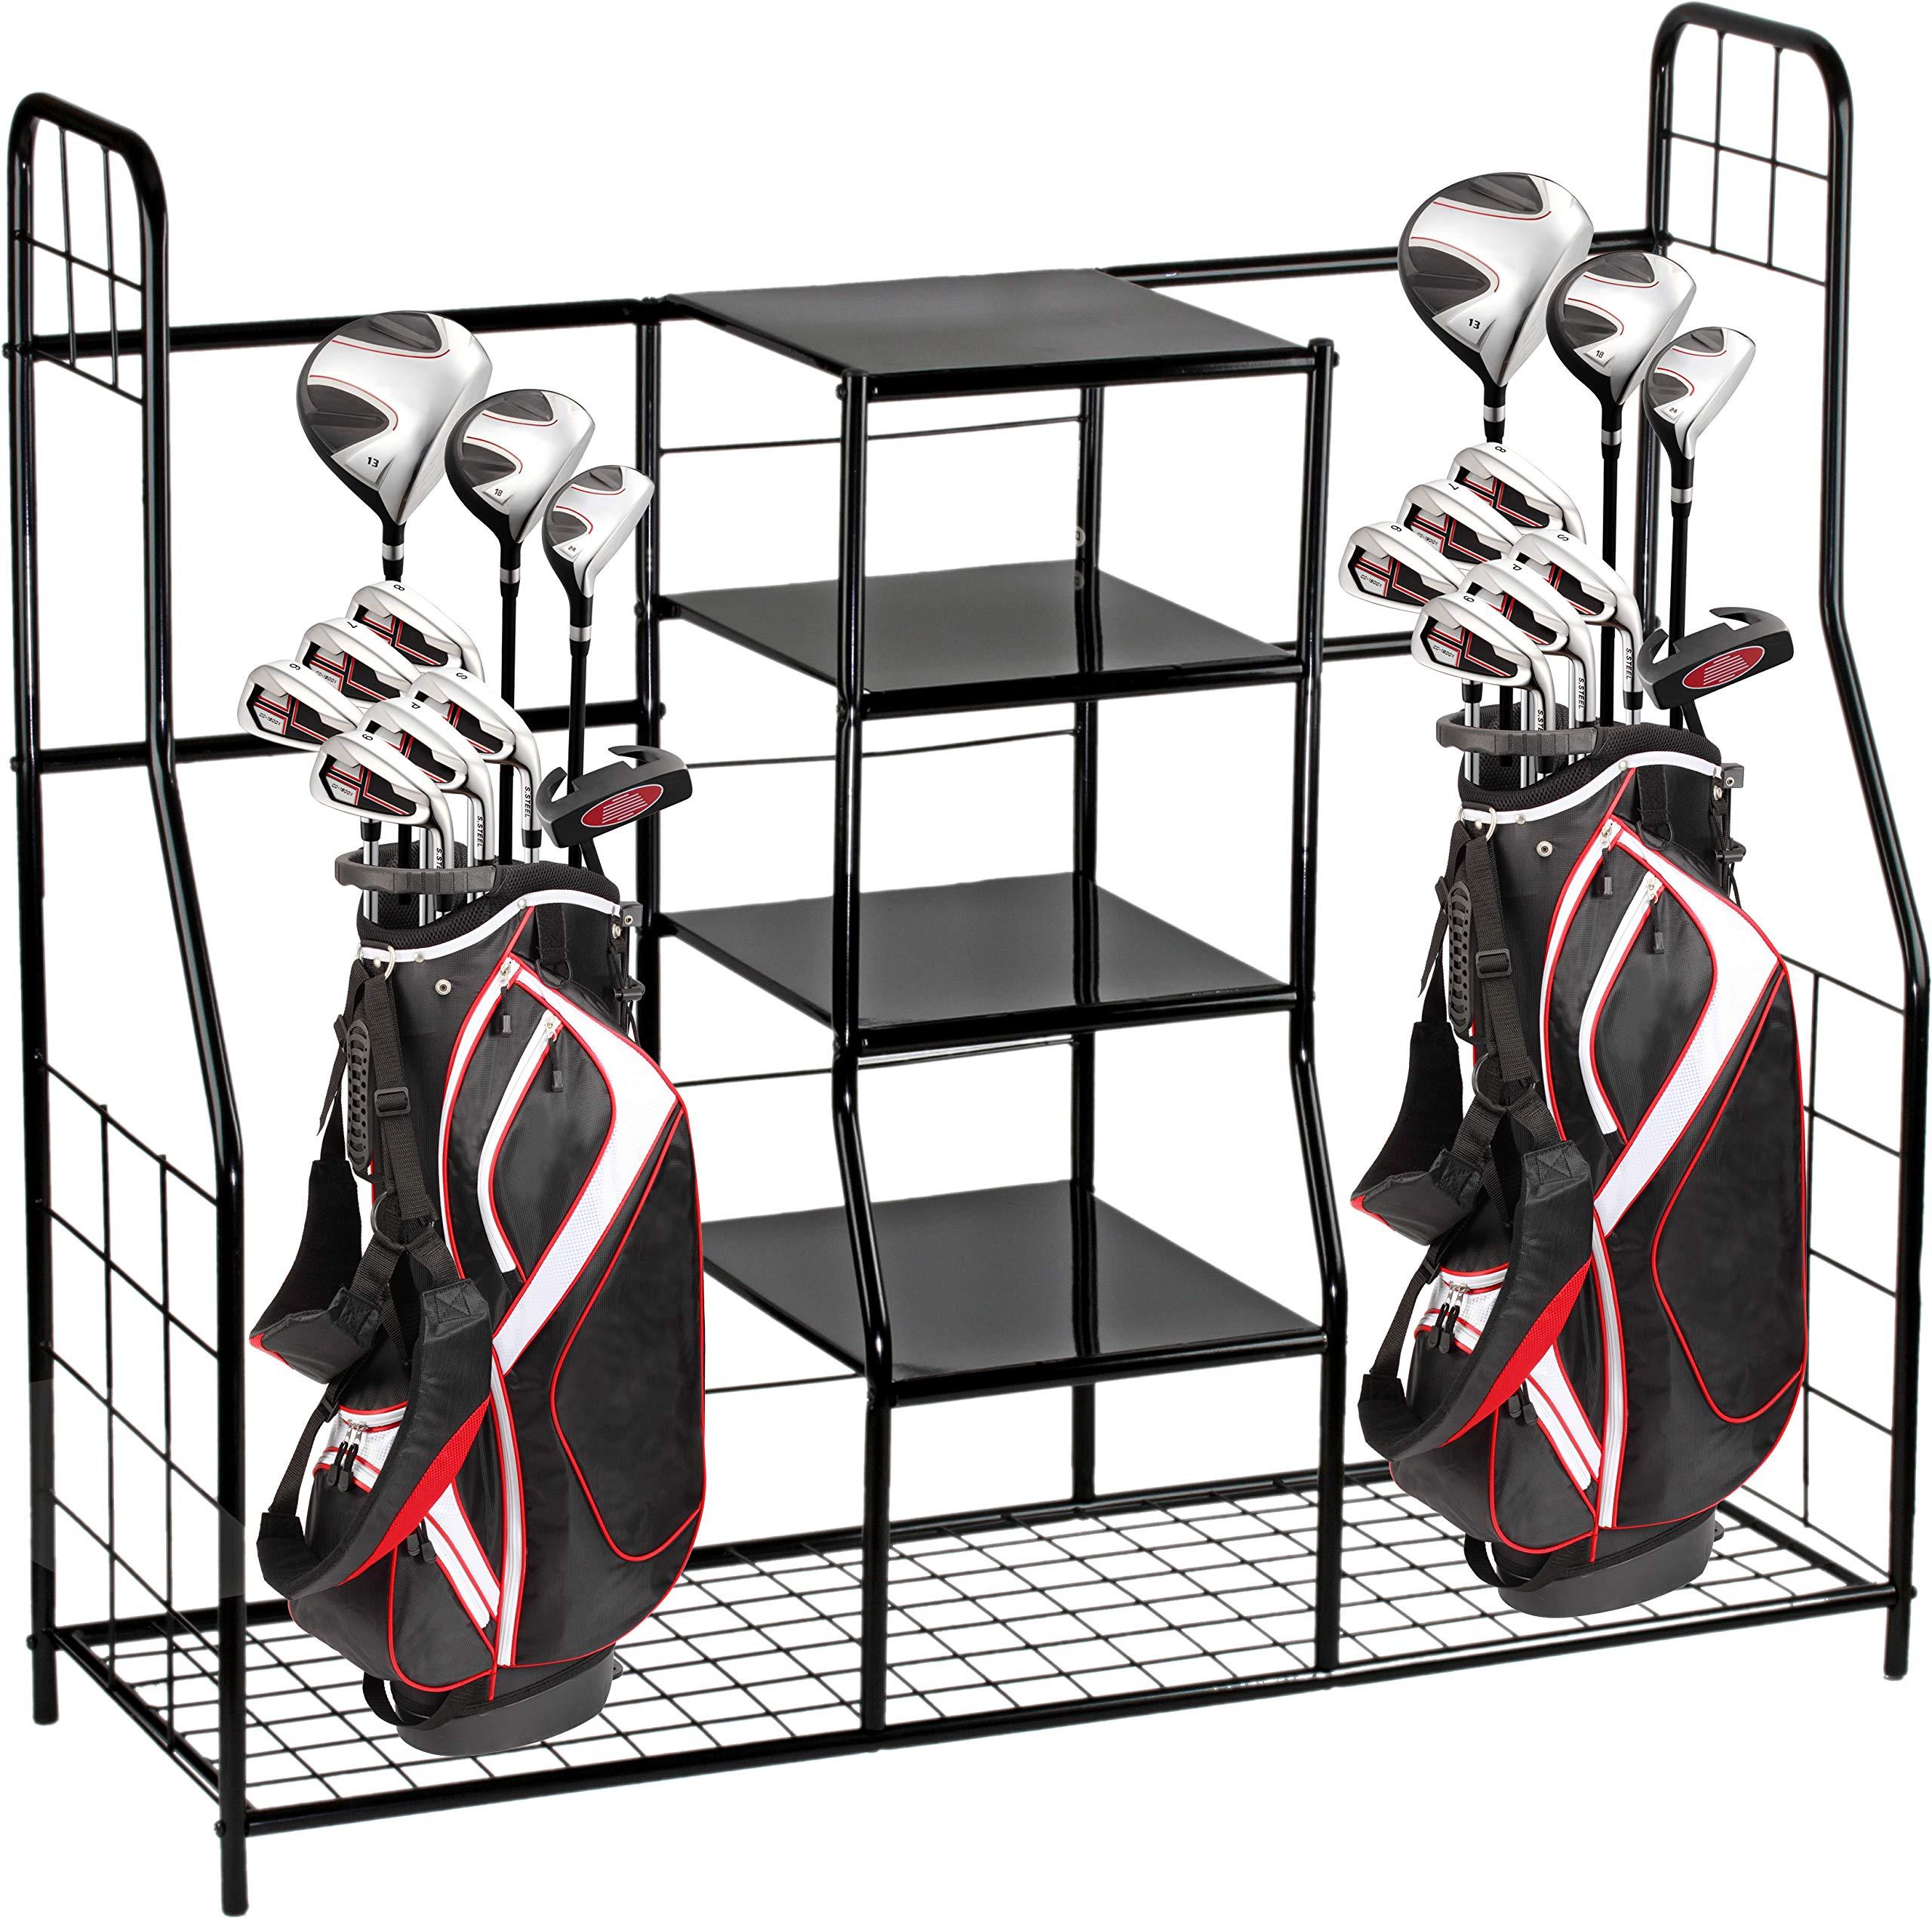 Home-it Golf Bag Sports Dual Golf Storage Organizer golf organizer rack by Home-it